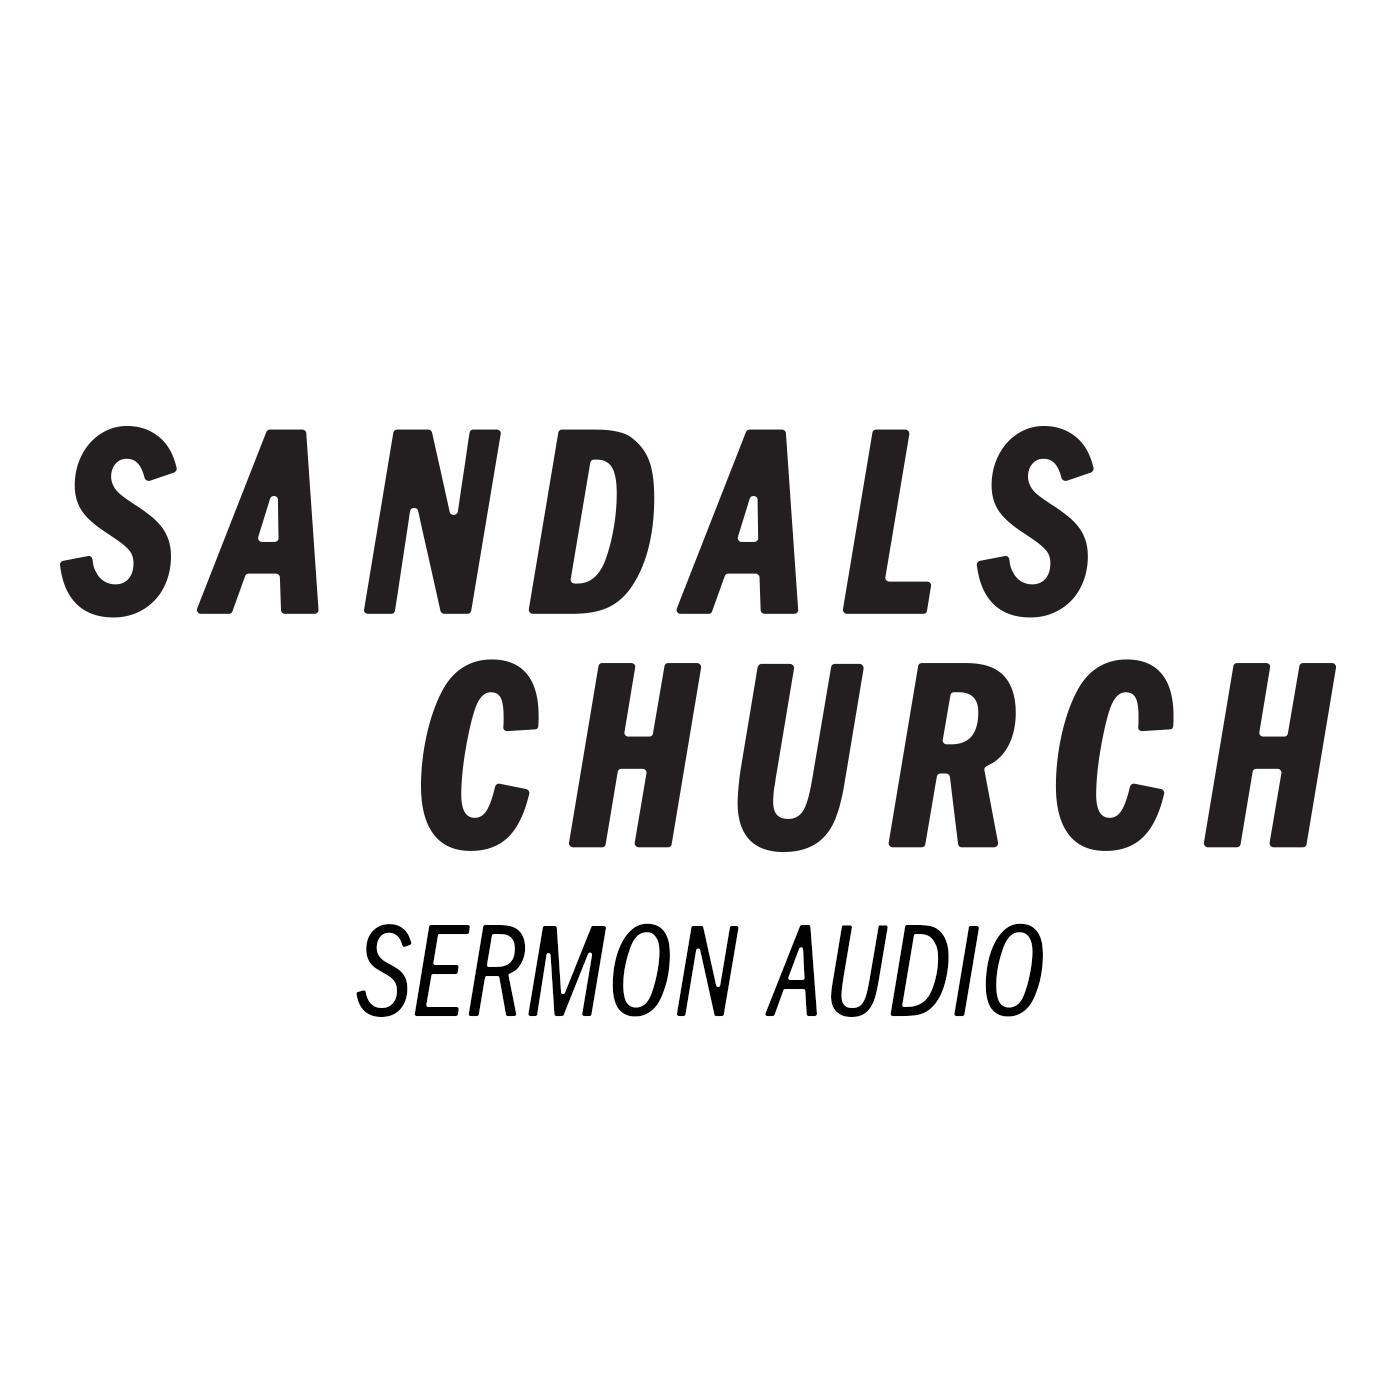 sermon audio android edition